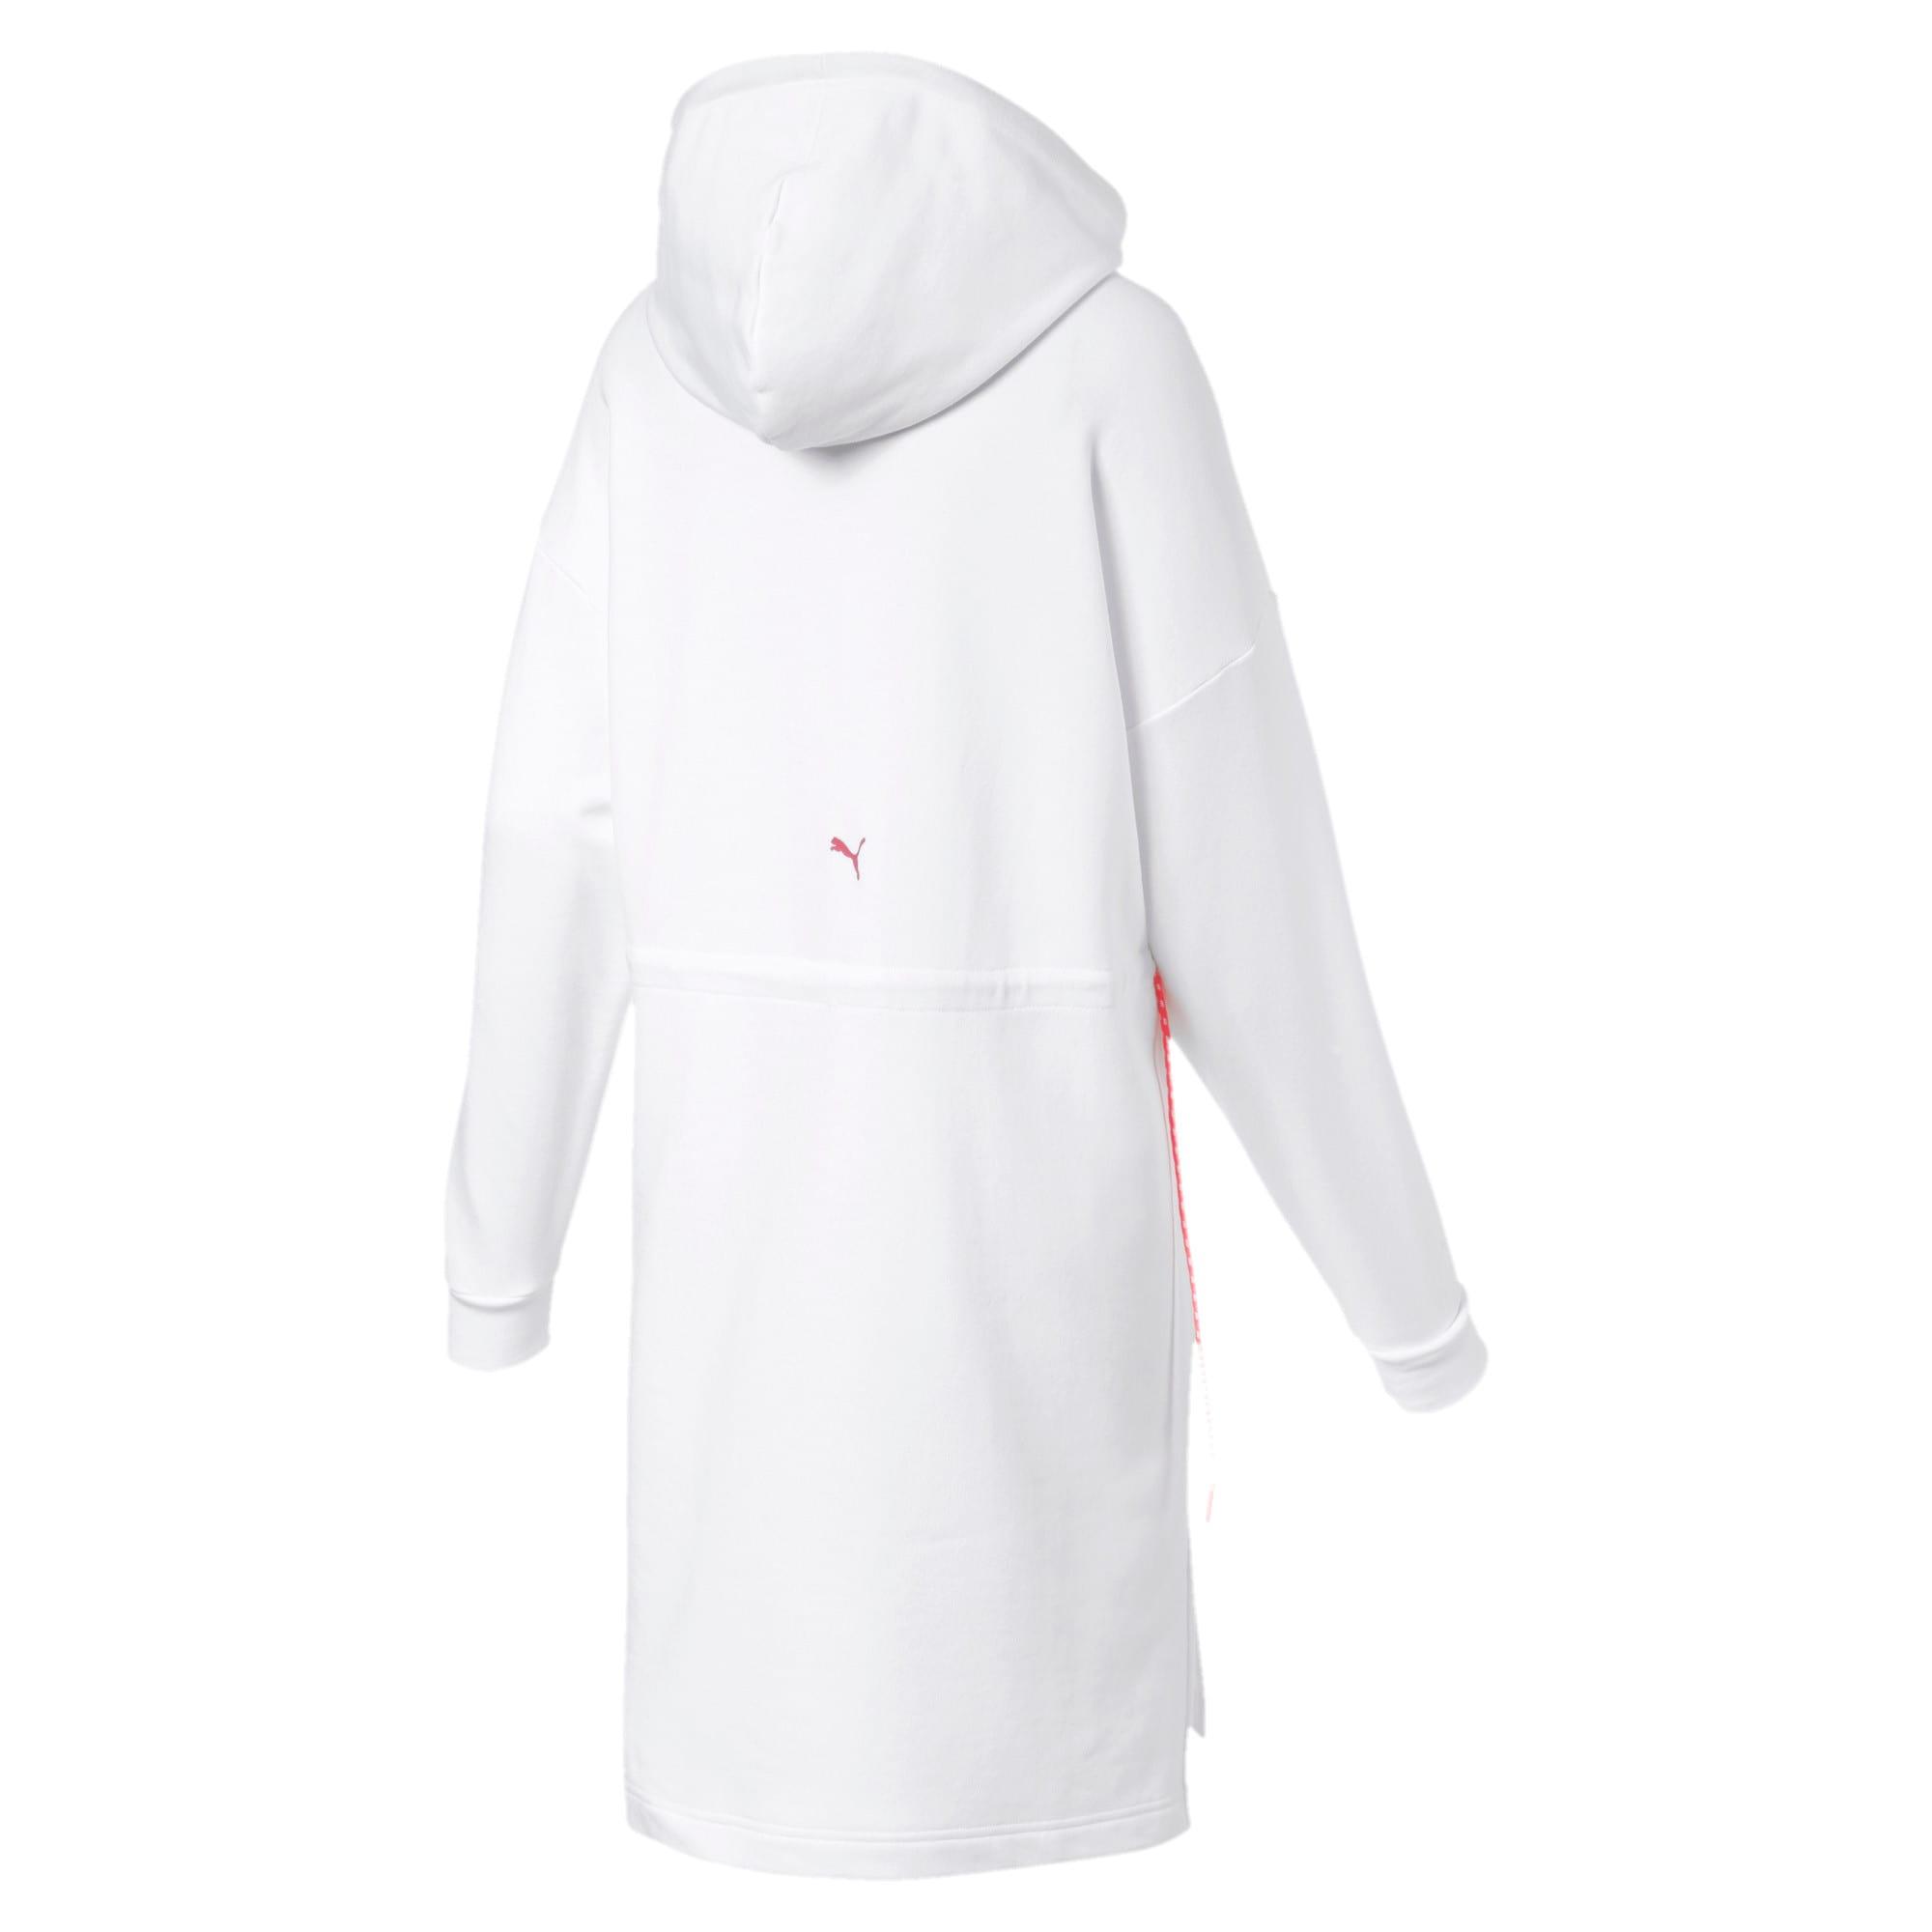 Thumbnail 6 of CHASE ウィメンズ フーデッドドレス, Puma White, medium-JPN